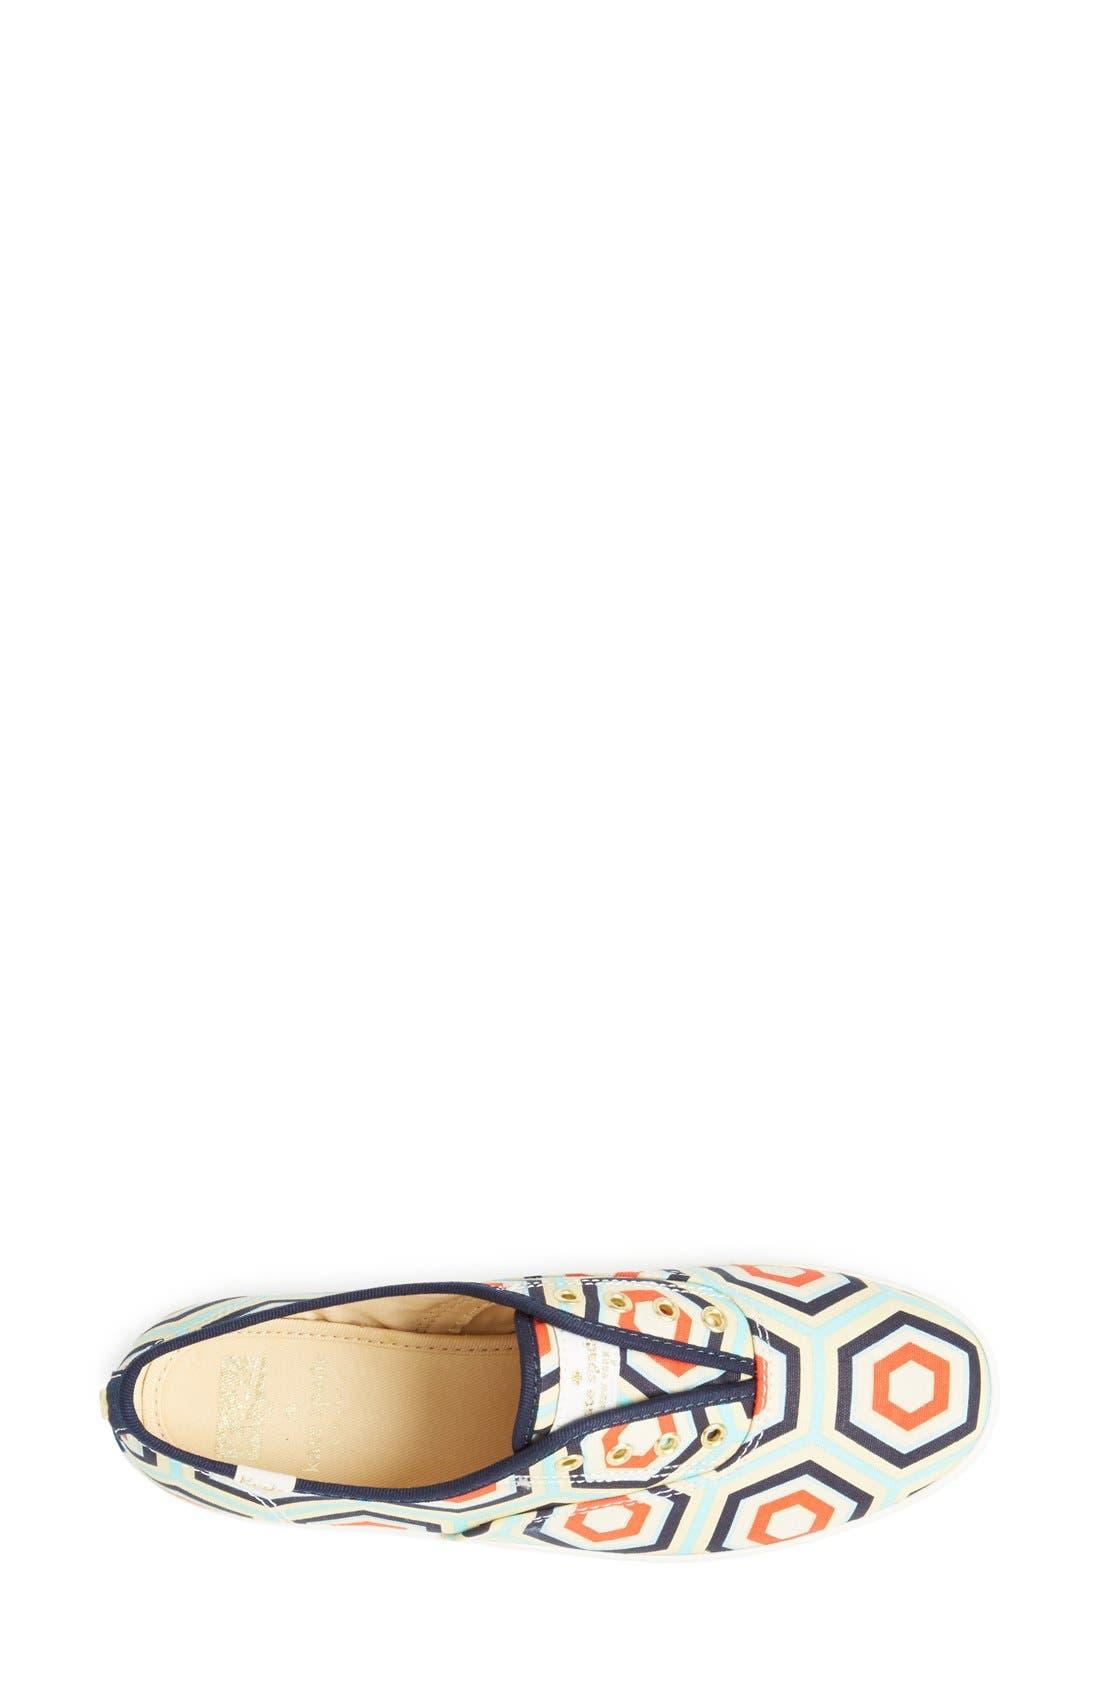 Alternate Image 3  - Keds® for kate spade new york 'champ' print canvas sneaker